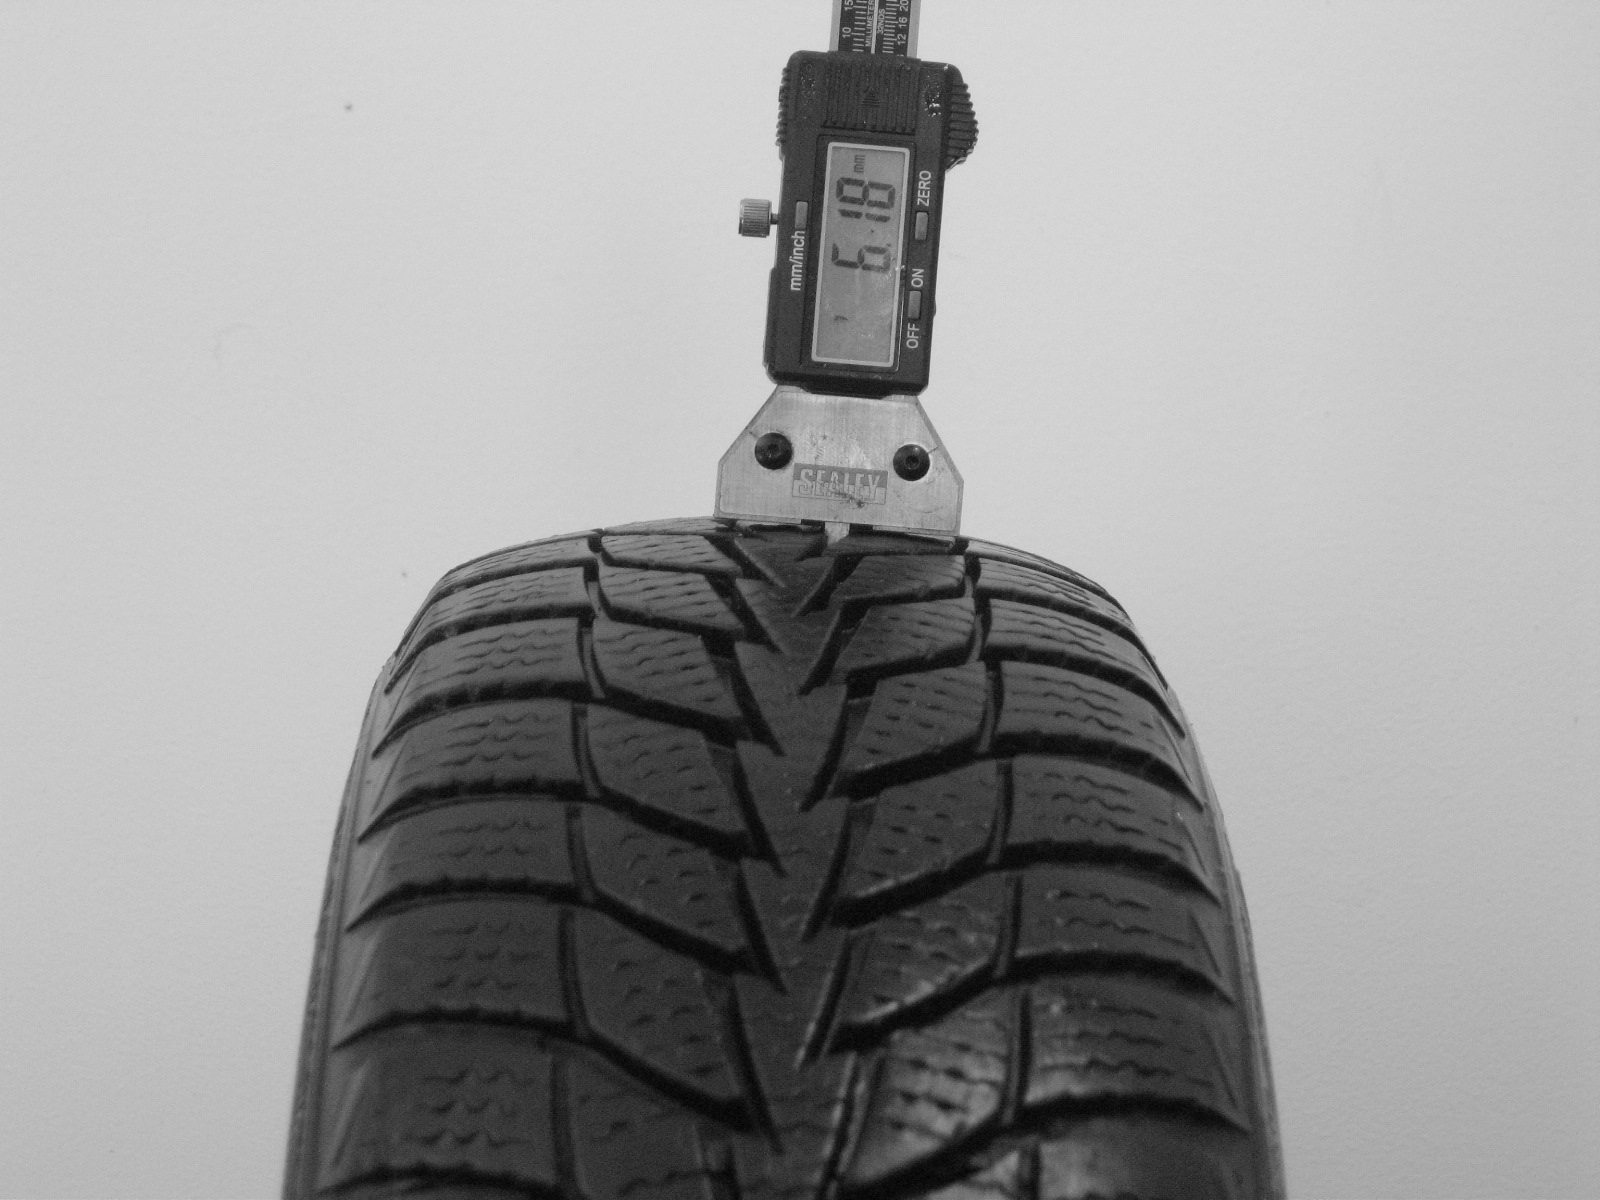 Použité-Pneu-Bazar - 155/70 R13 MATADOR MP52 NORDICA BASIC -kusovka-rezerva 3mm